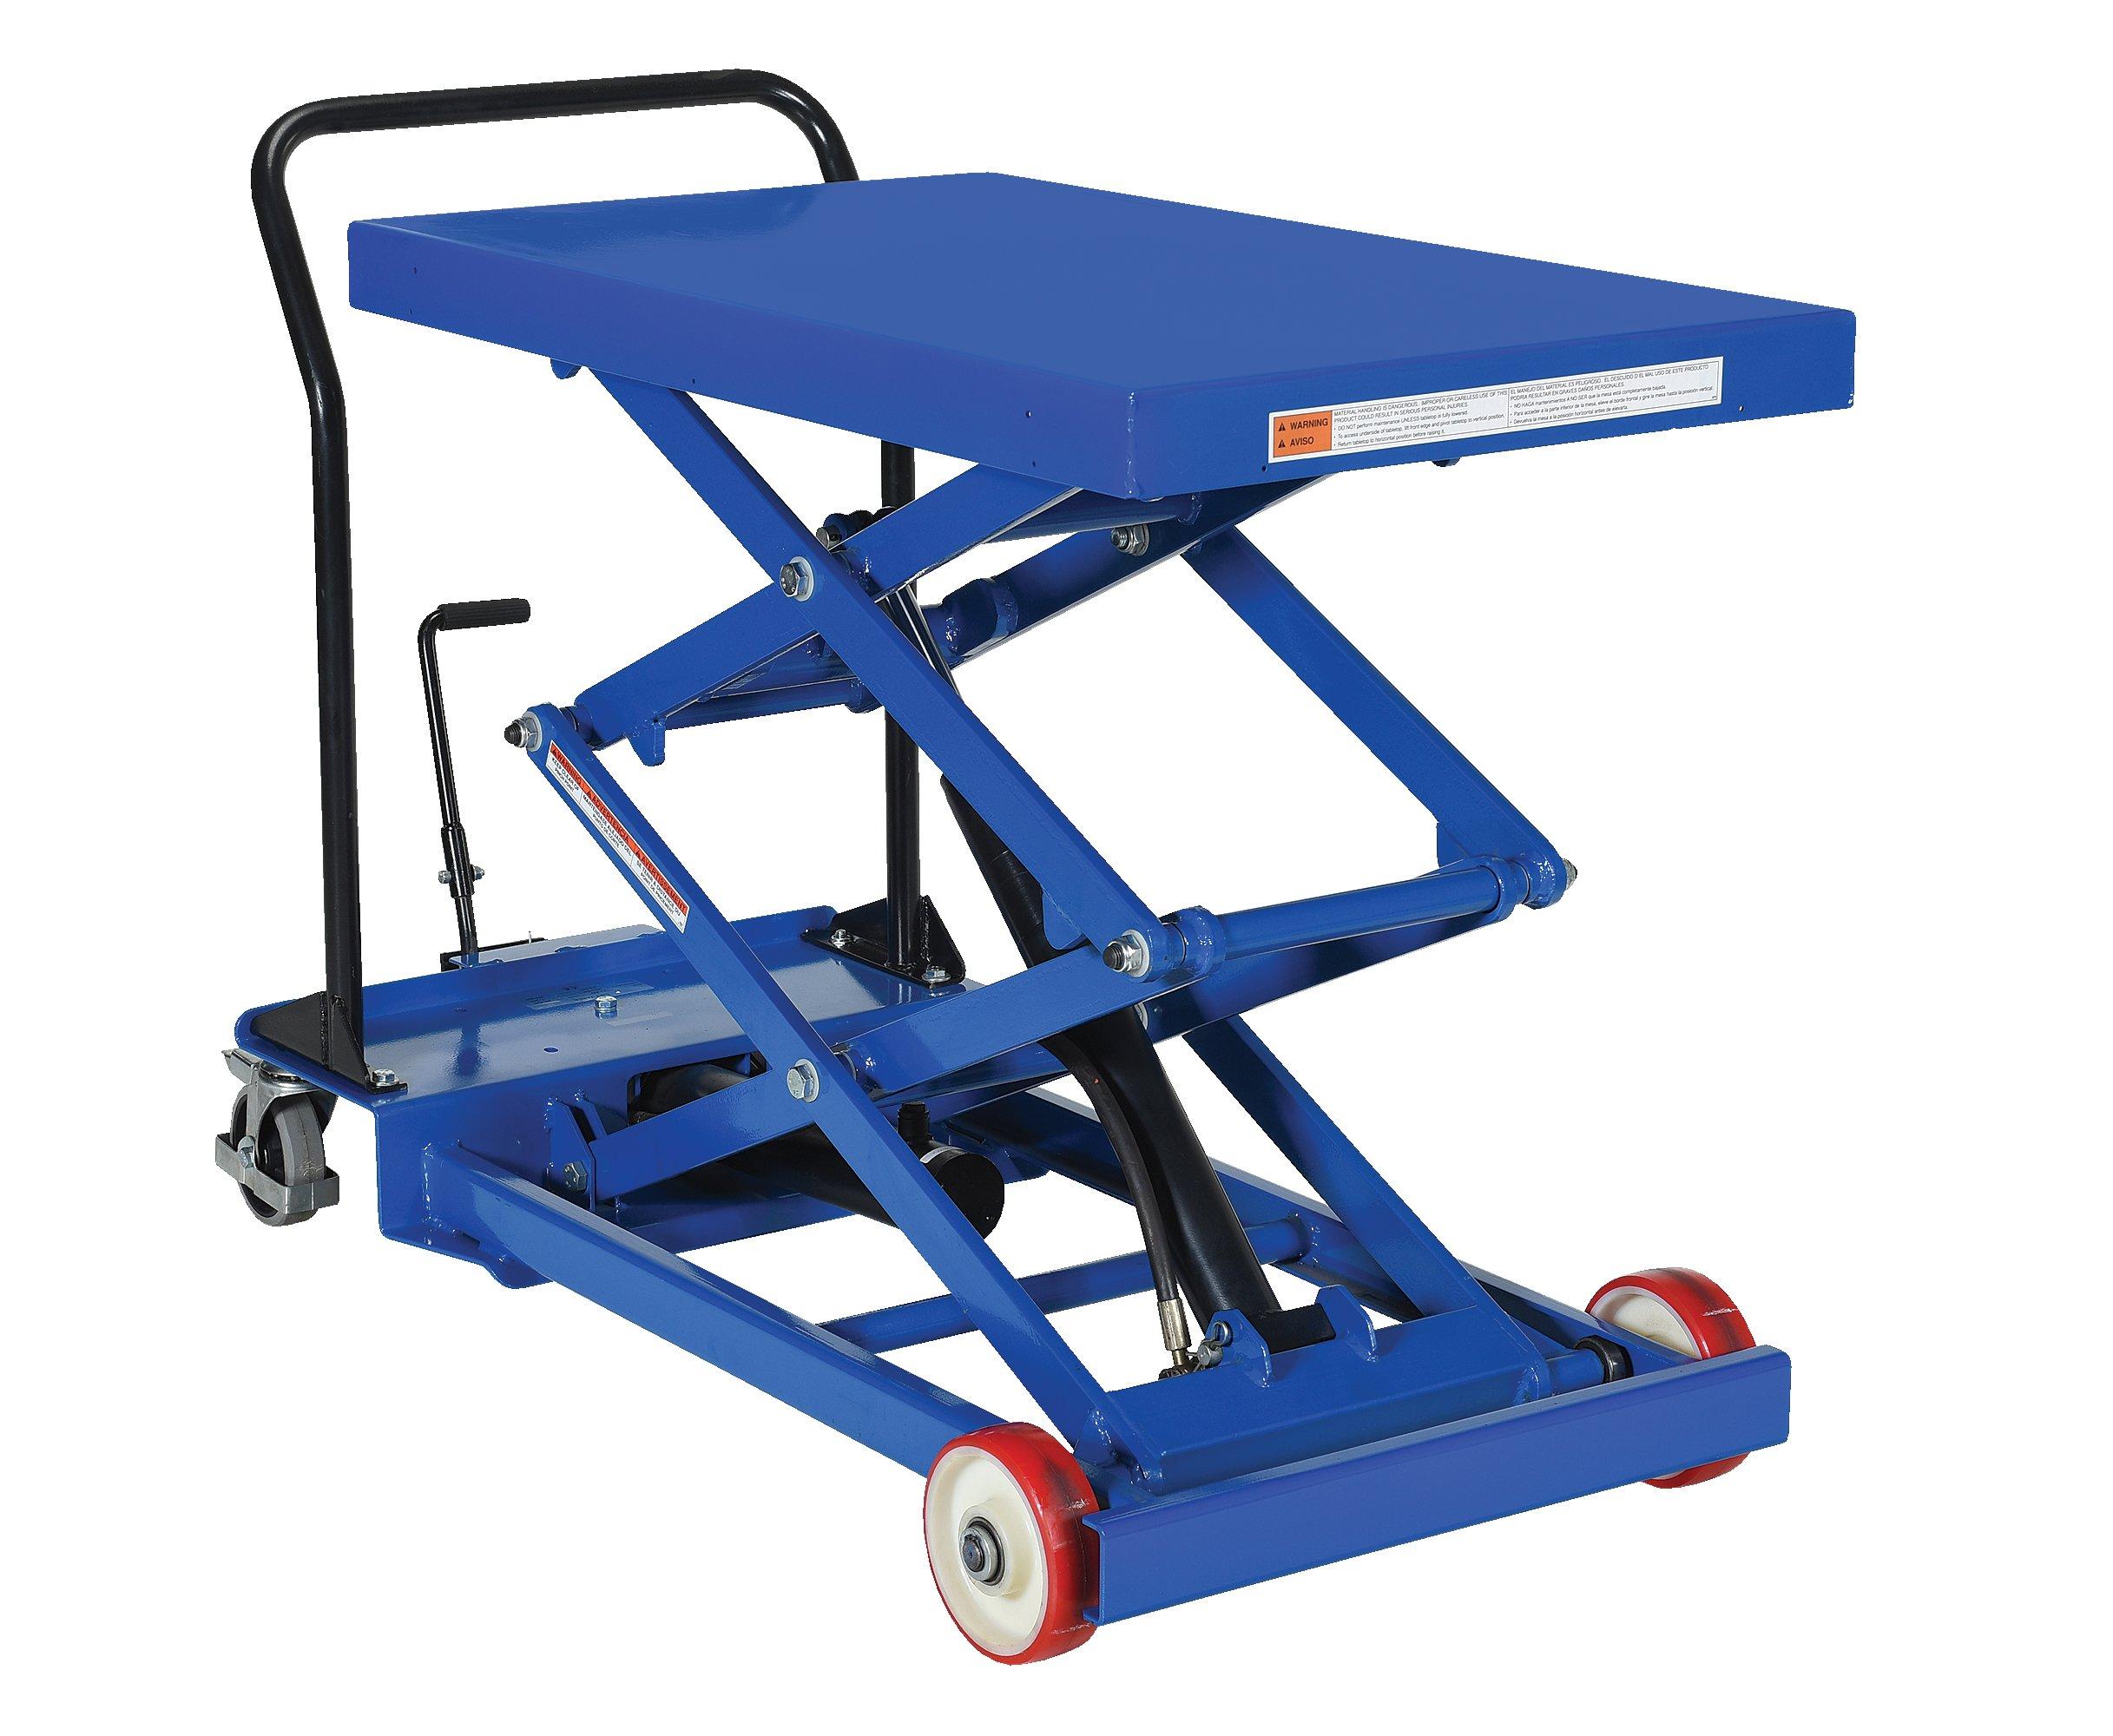 Vestil CART-1000-D-FR Steel Double Scissor Cart, Foot-Actuated, Single Speed Hydraulic Pump, 1000 lb. Capacity, 40'' x 24'' Platform, Height Range 11-3/4'' to 61'', Blue